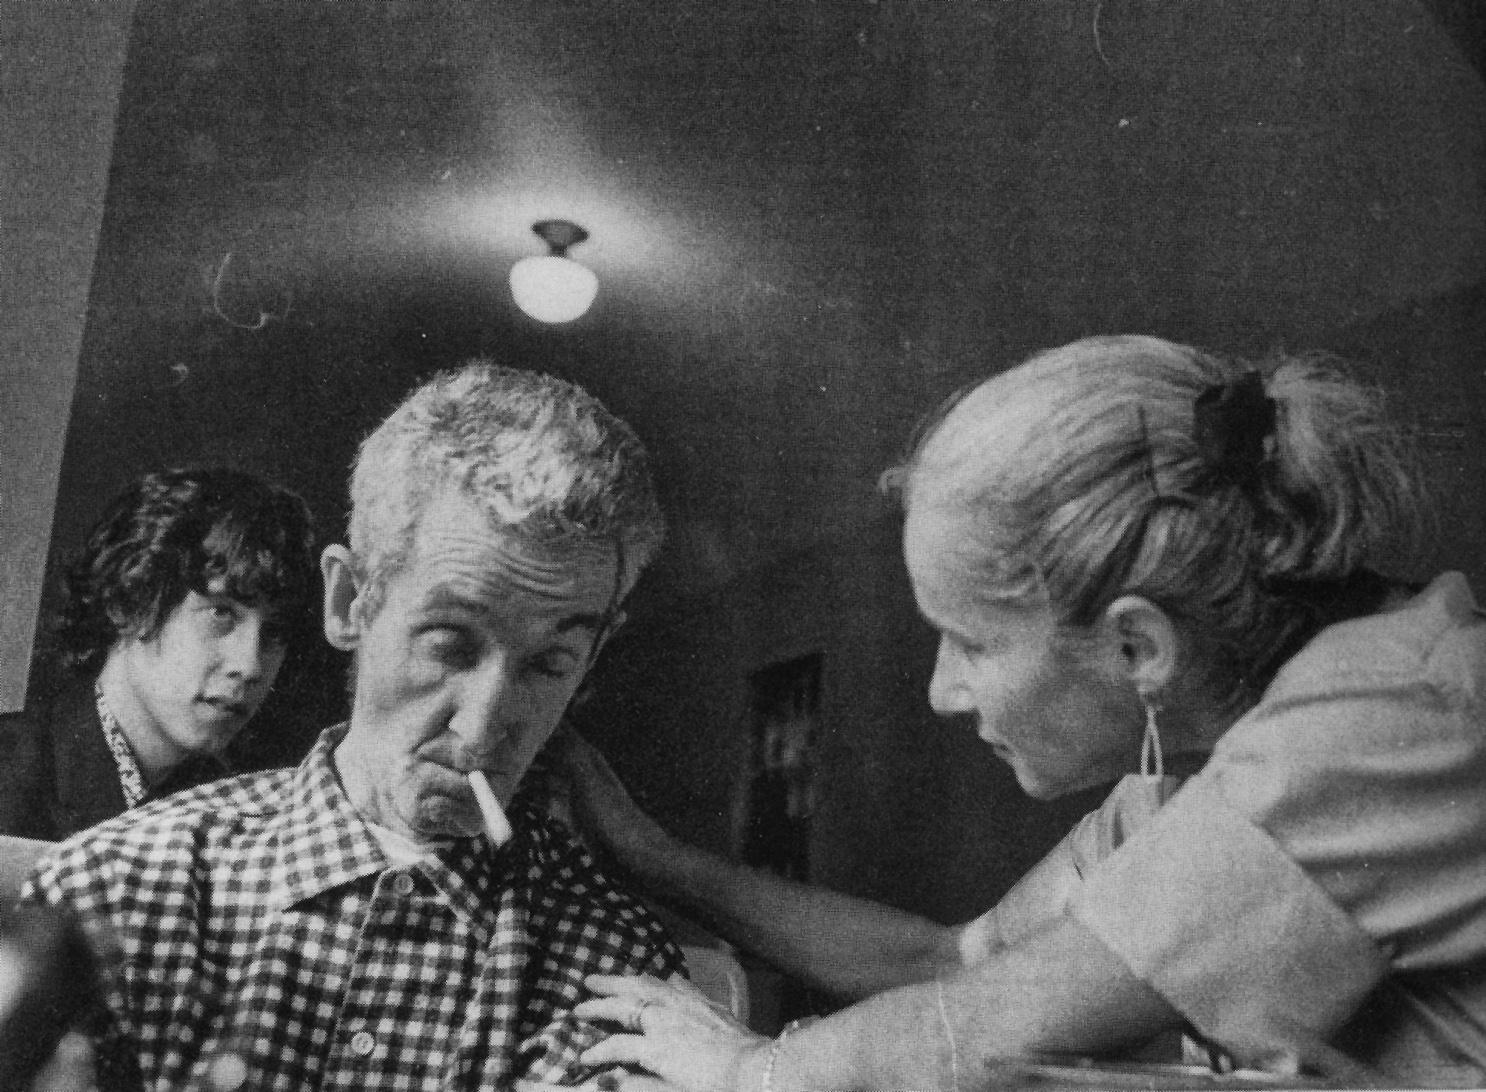 Arlo Guthrie, Woody Guthrie y Marjorie Mazia en el hospital de Brooklyn, 1966